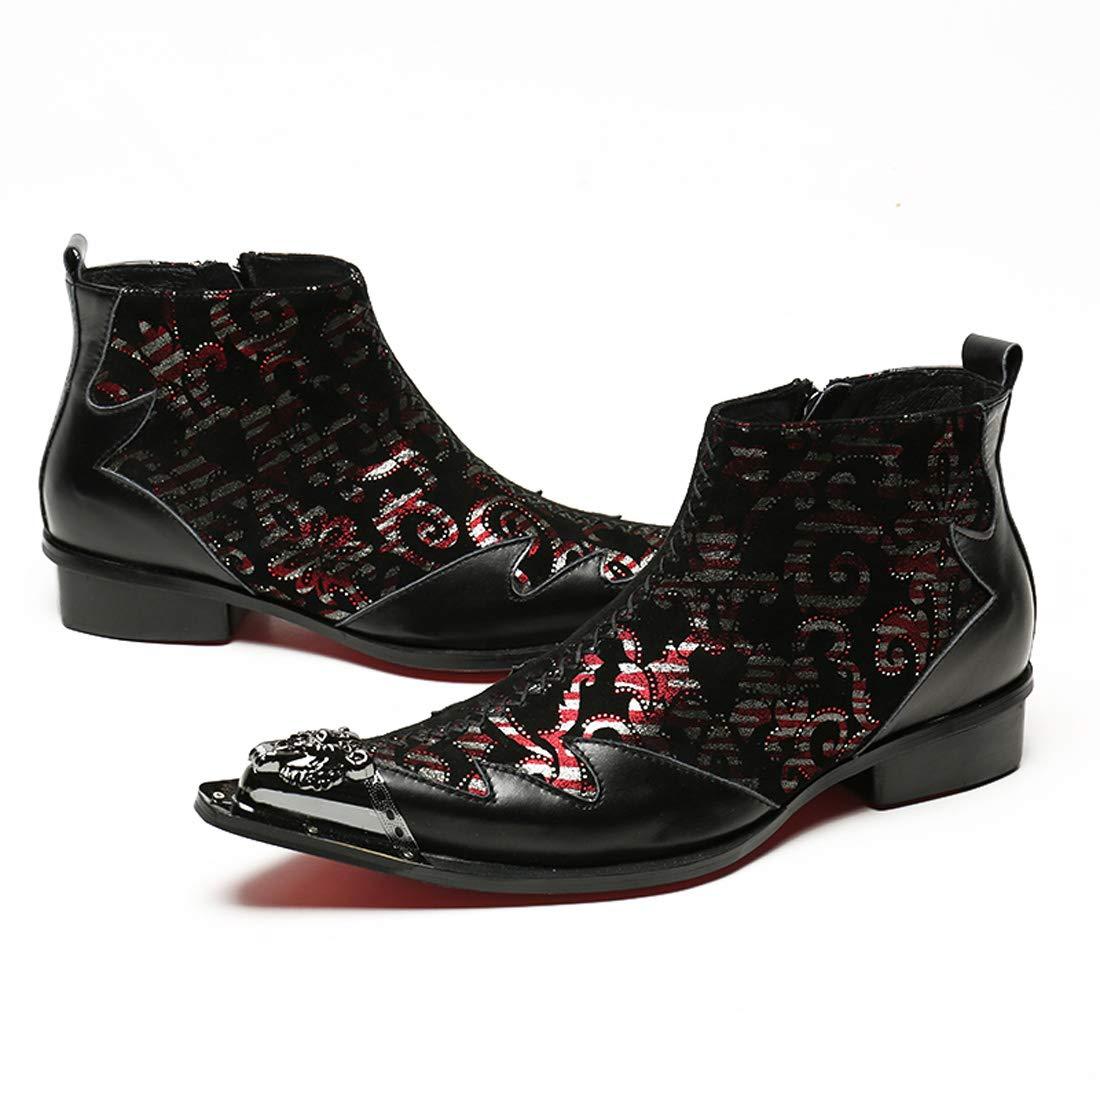 DANDANJIE Herren Stiefel Carvings British Retro Business Stiefel Neuheit Schuhe Schuhe Schuhe 7958ee